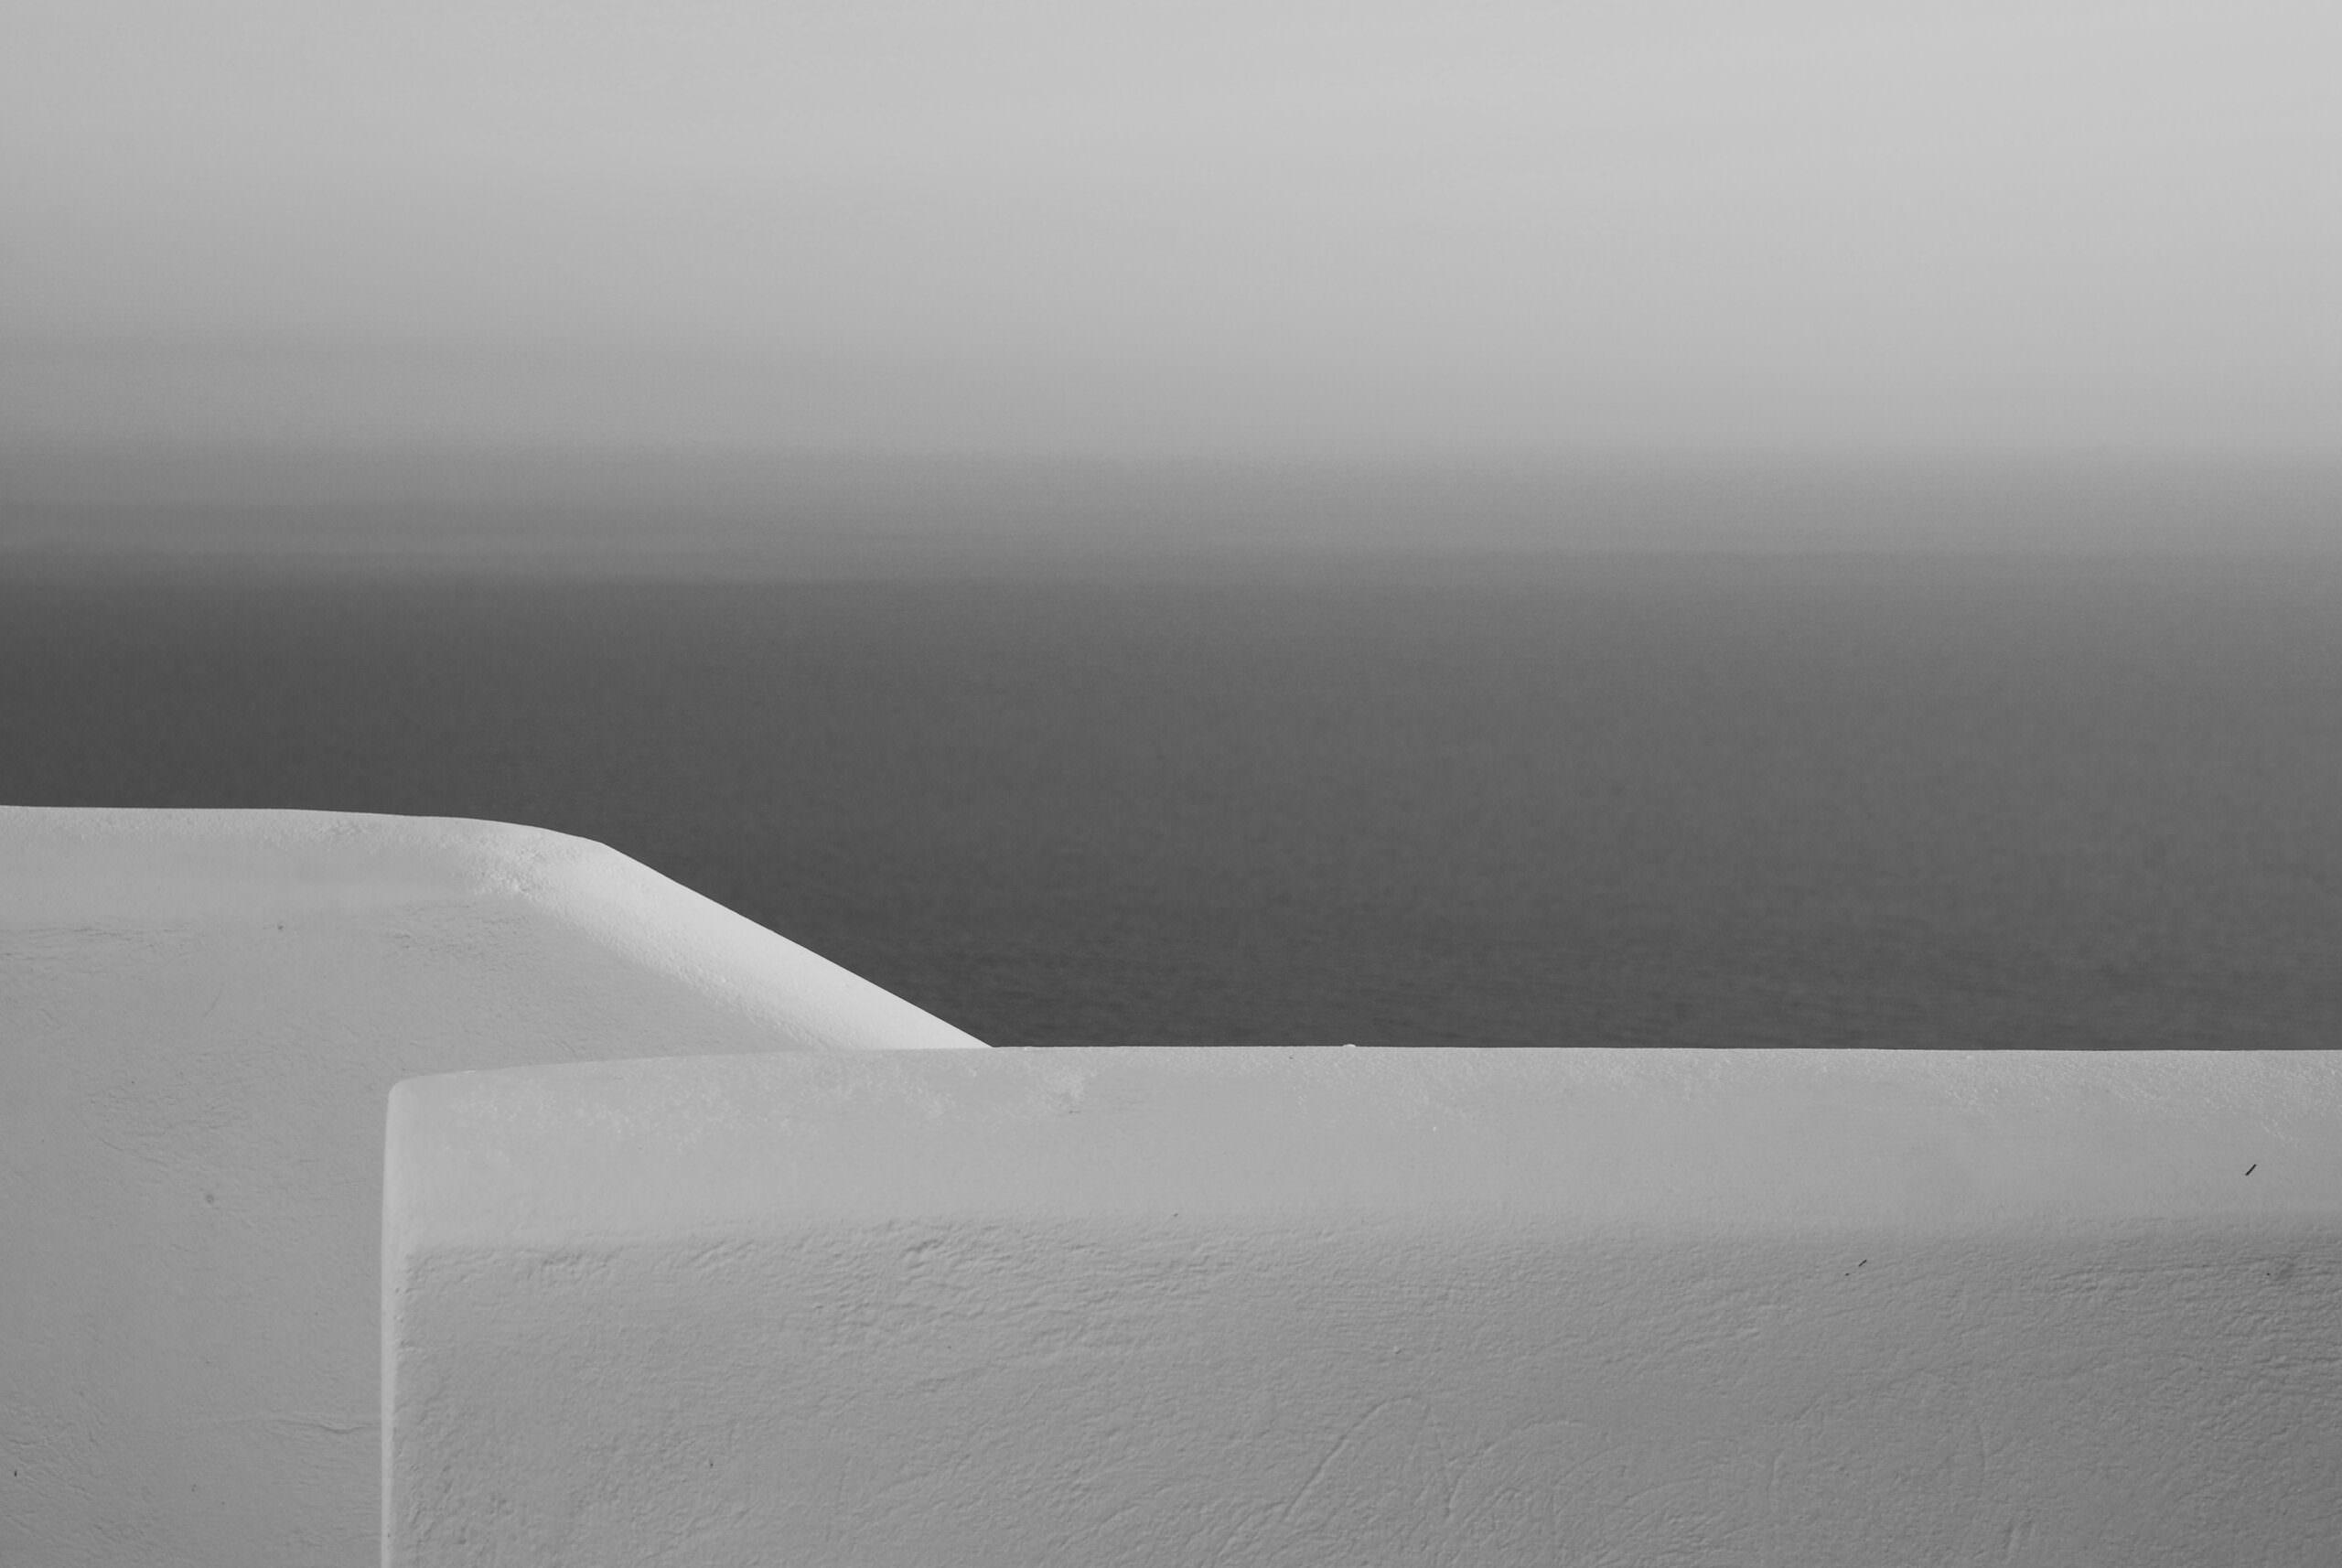 atmosfera-grey